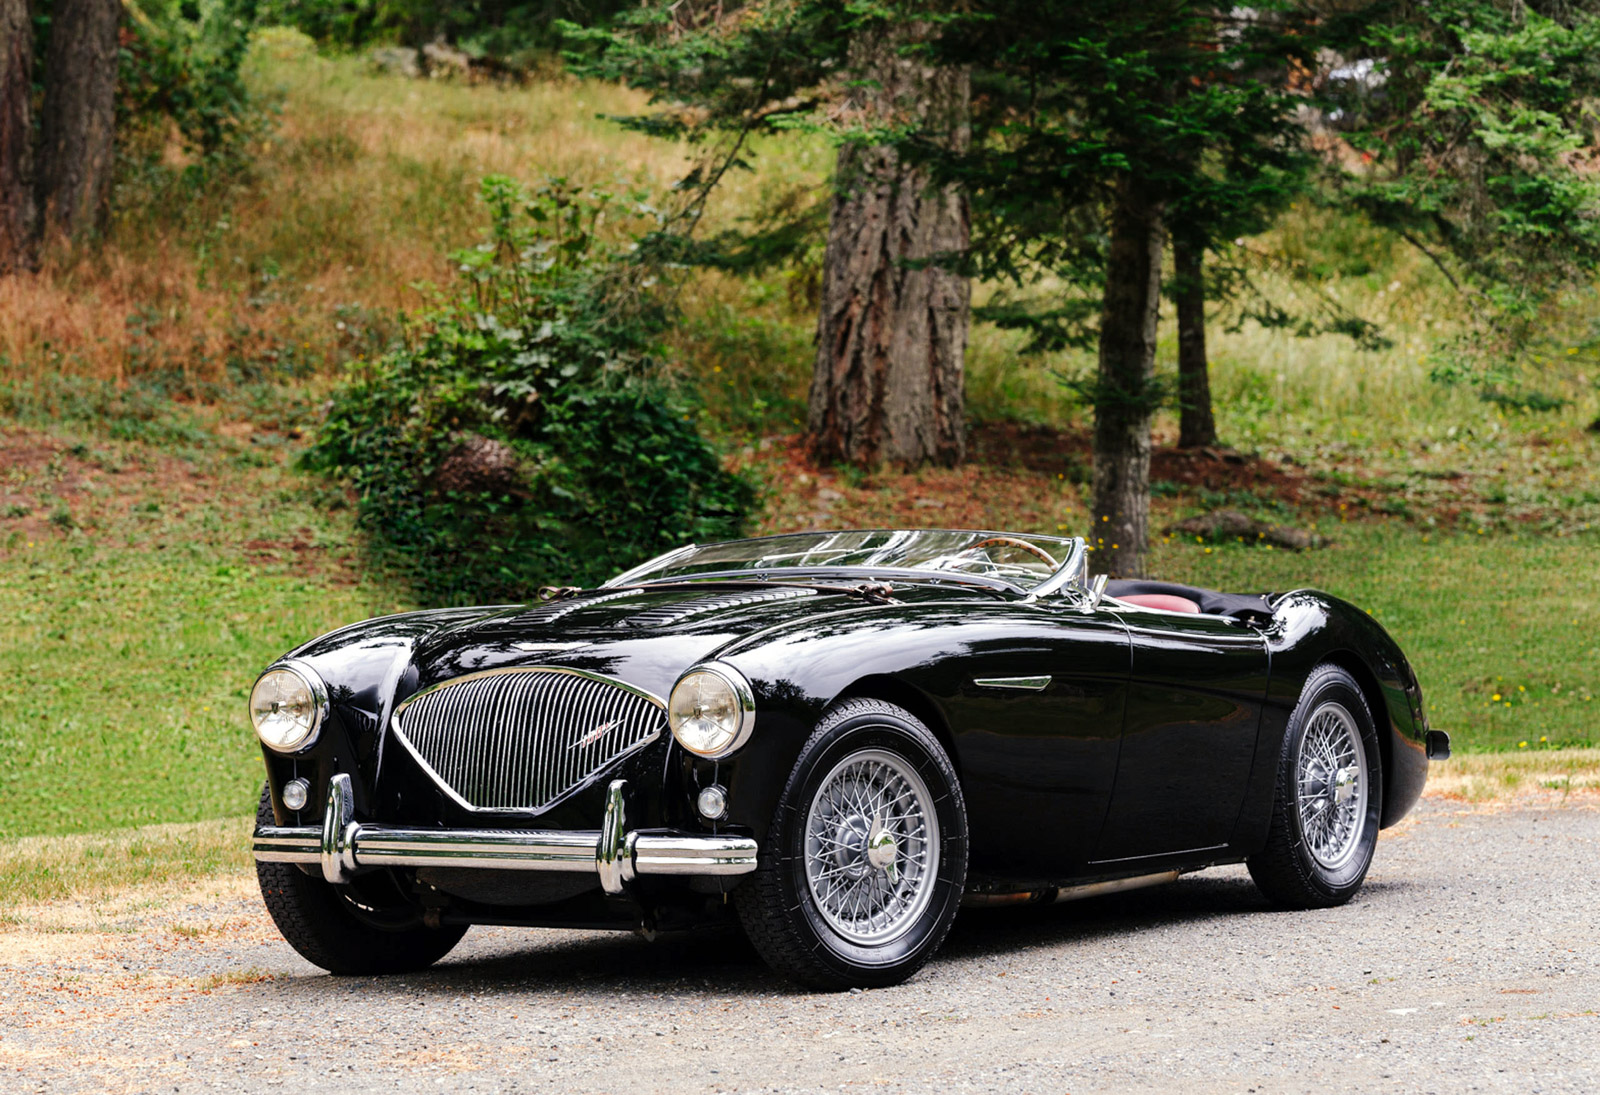 1956 Austin-Healey restored automobile